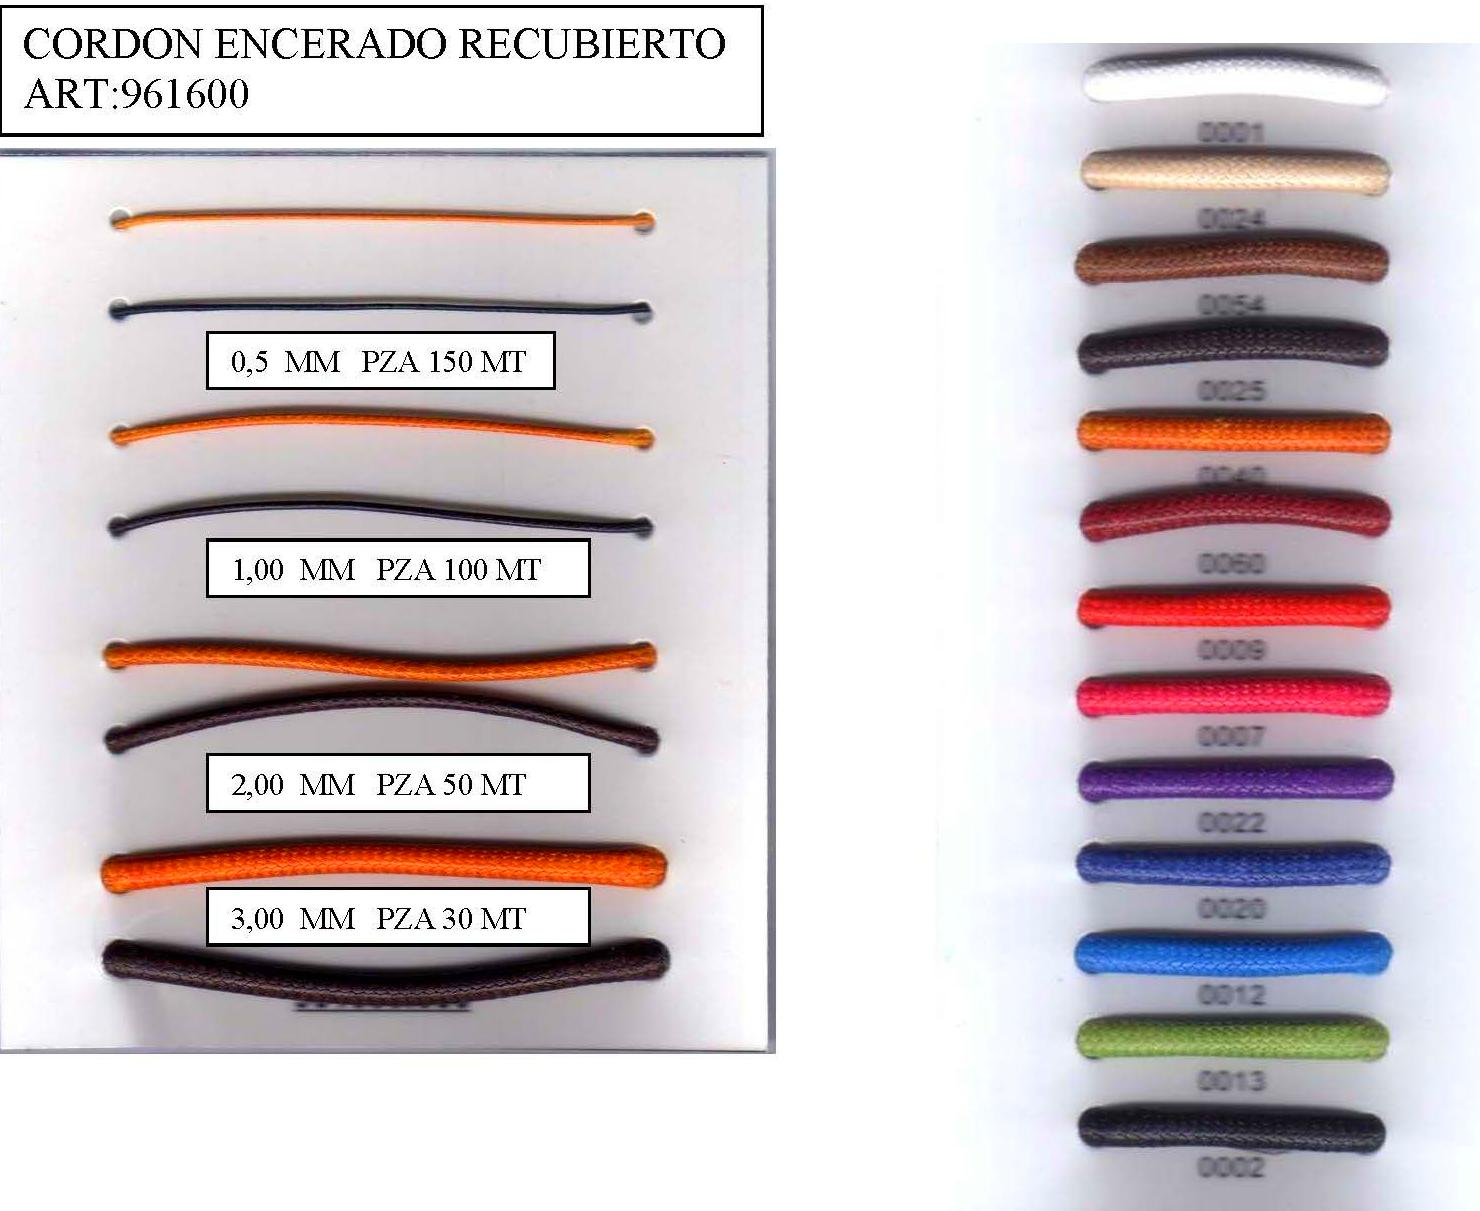 CORDON ENCERADO RECUBIERTO ART:961600